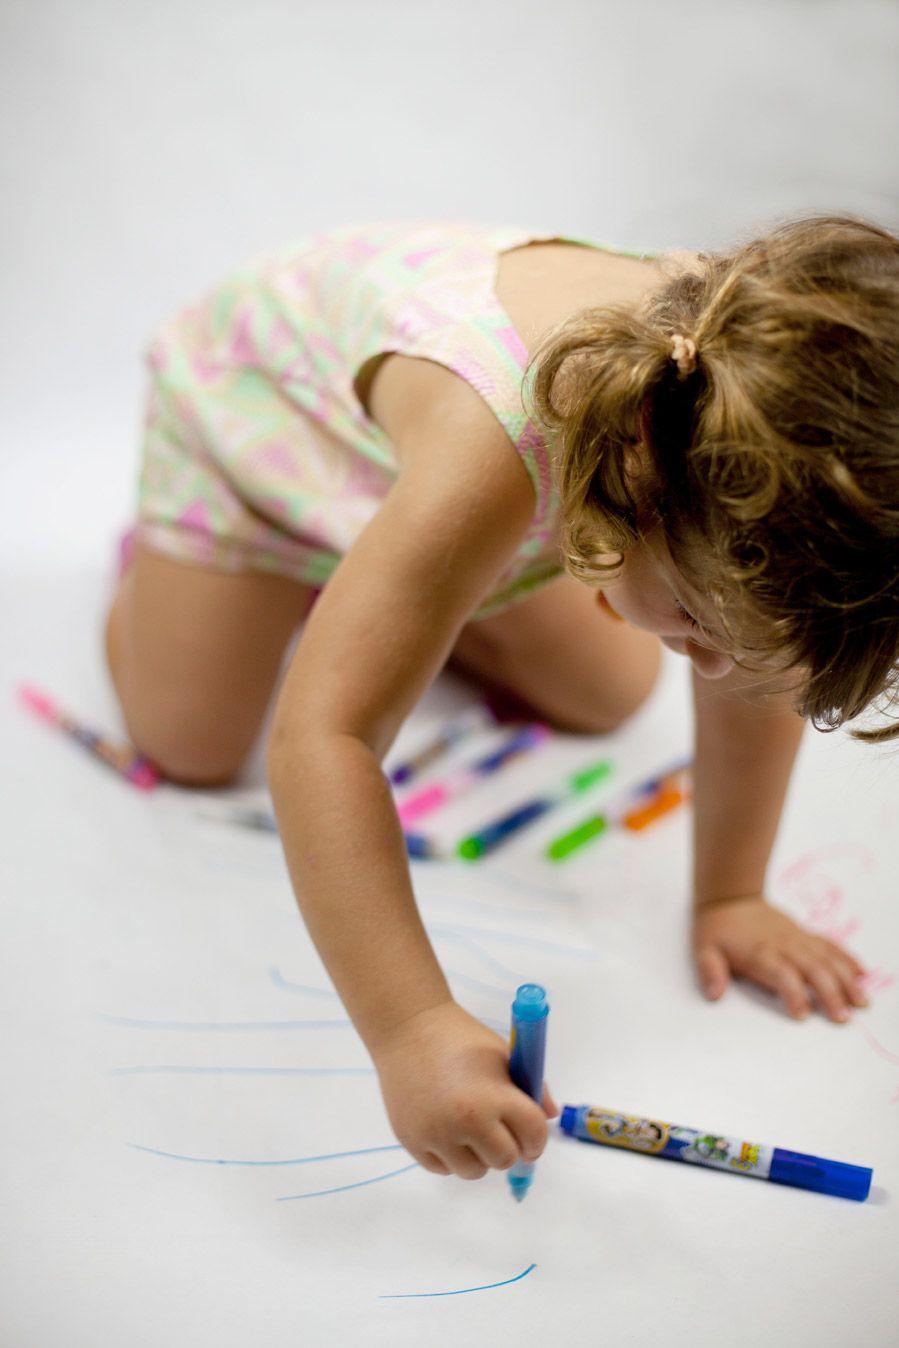 PRENDA NIÑA H.C.B. FANTASIA VERDE (2-3 AÑOS)  Dona mas color a sus vidas  http://www.helpchildrenbcn.com/product/prenda-nina-hcb-fantasia-verde-2-3-anos/